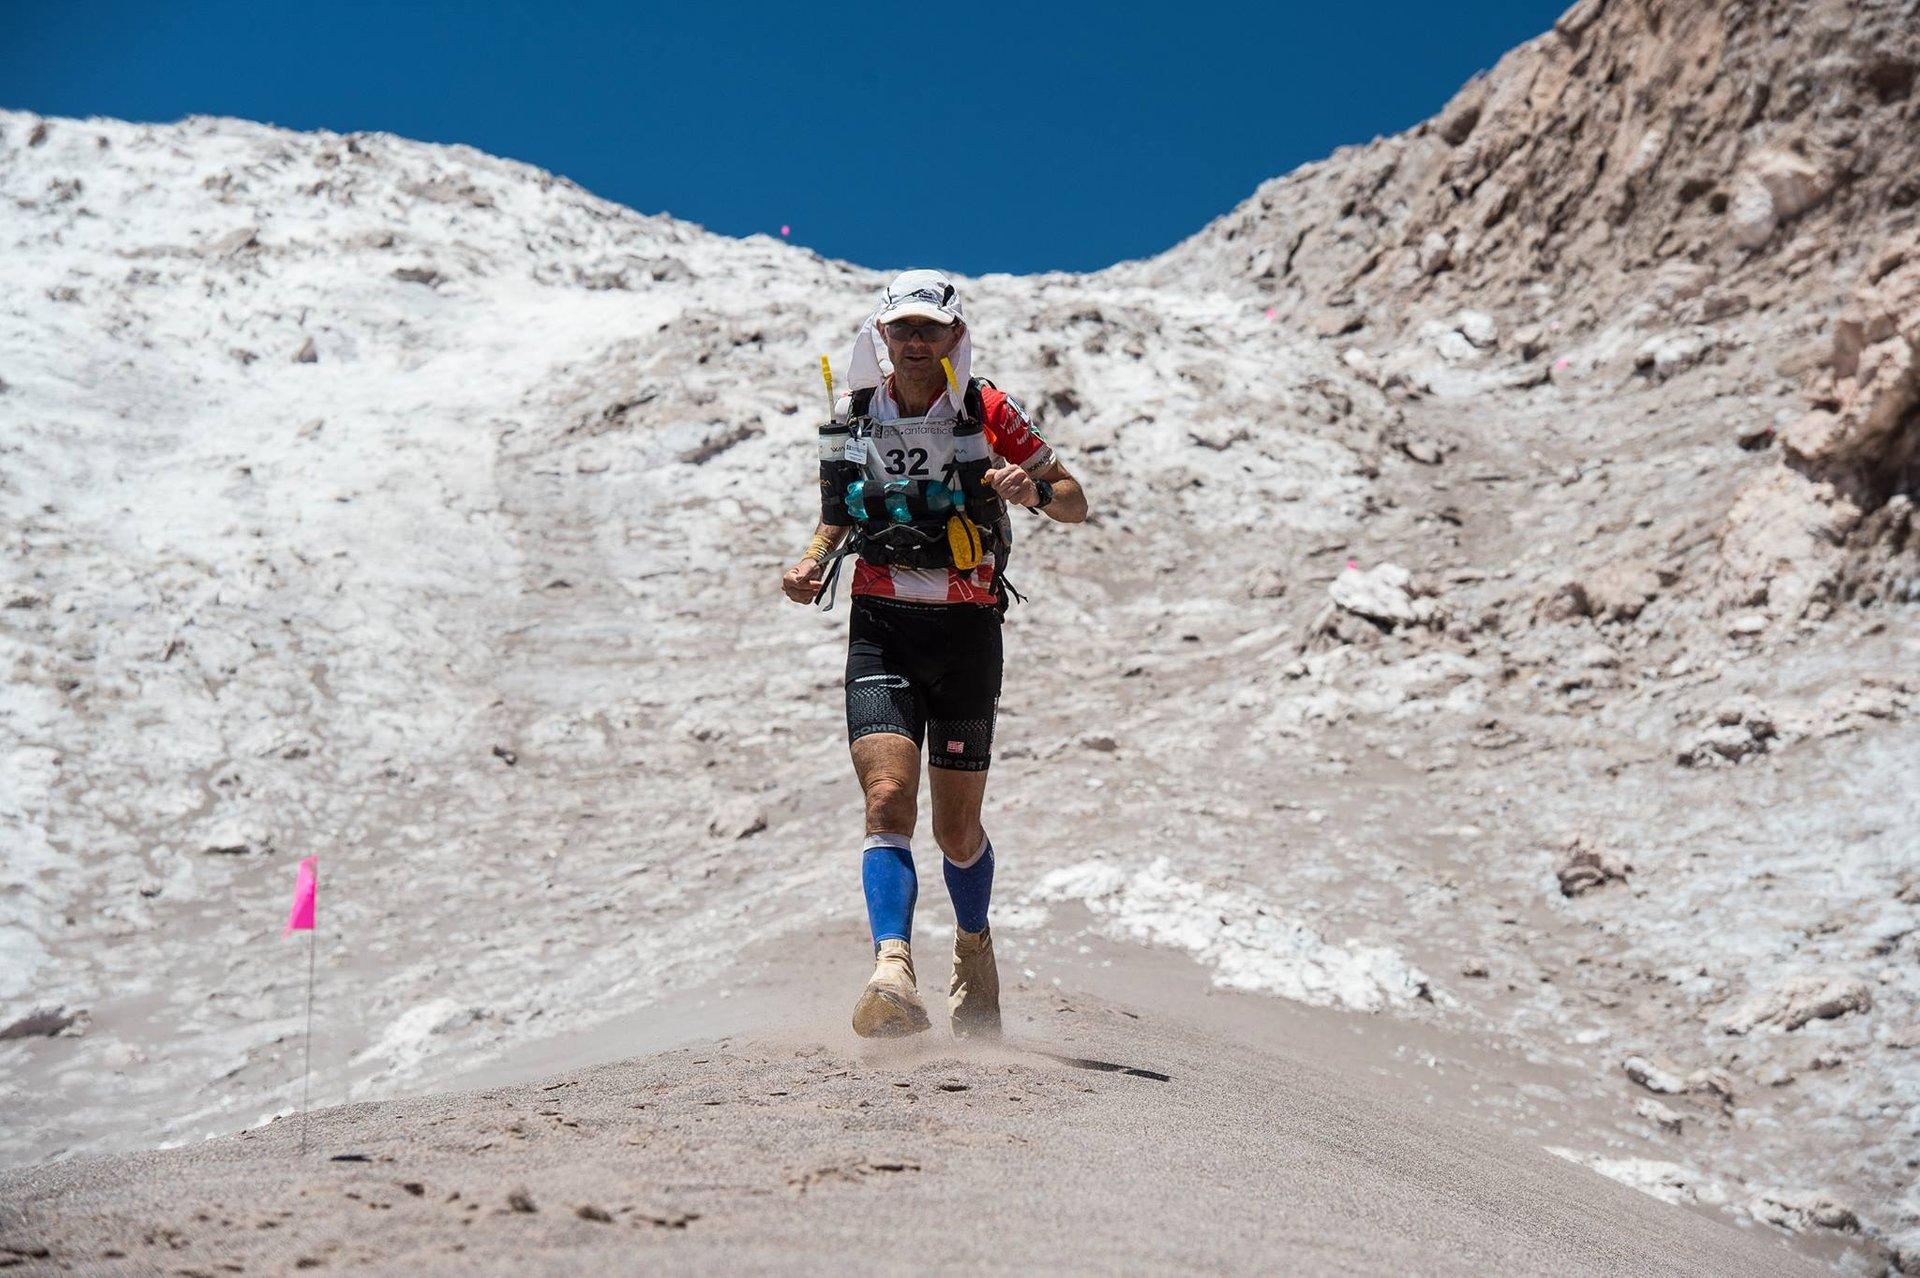 Atacama Crossing in Chile - Best Season 2020